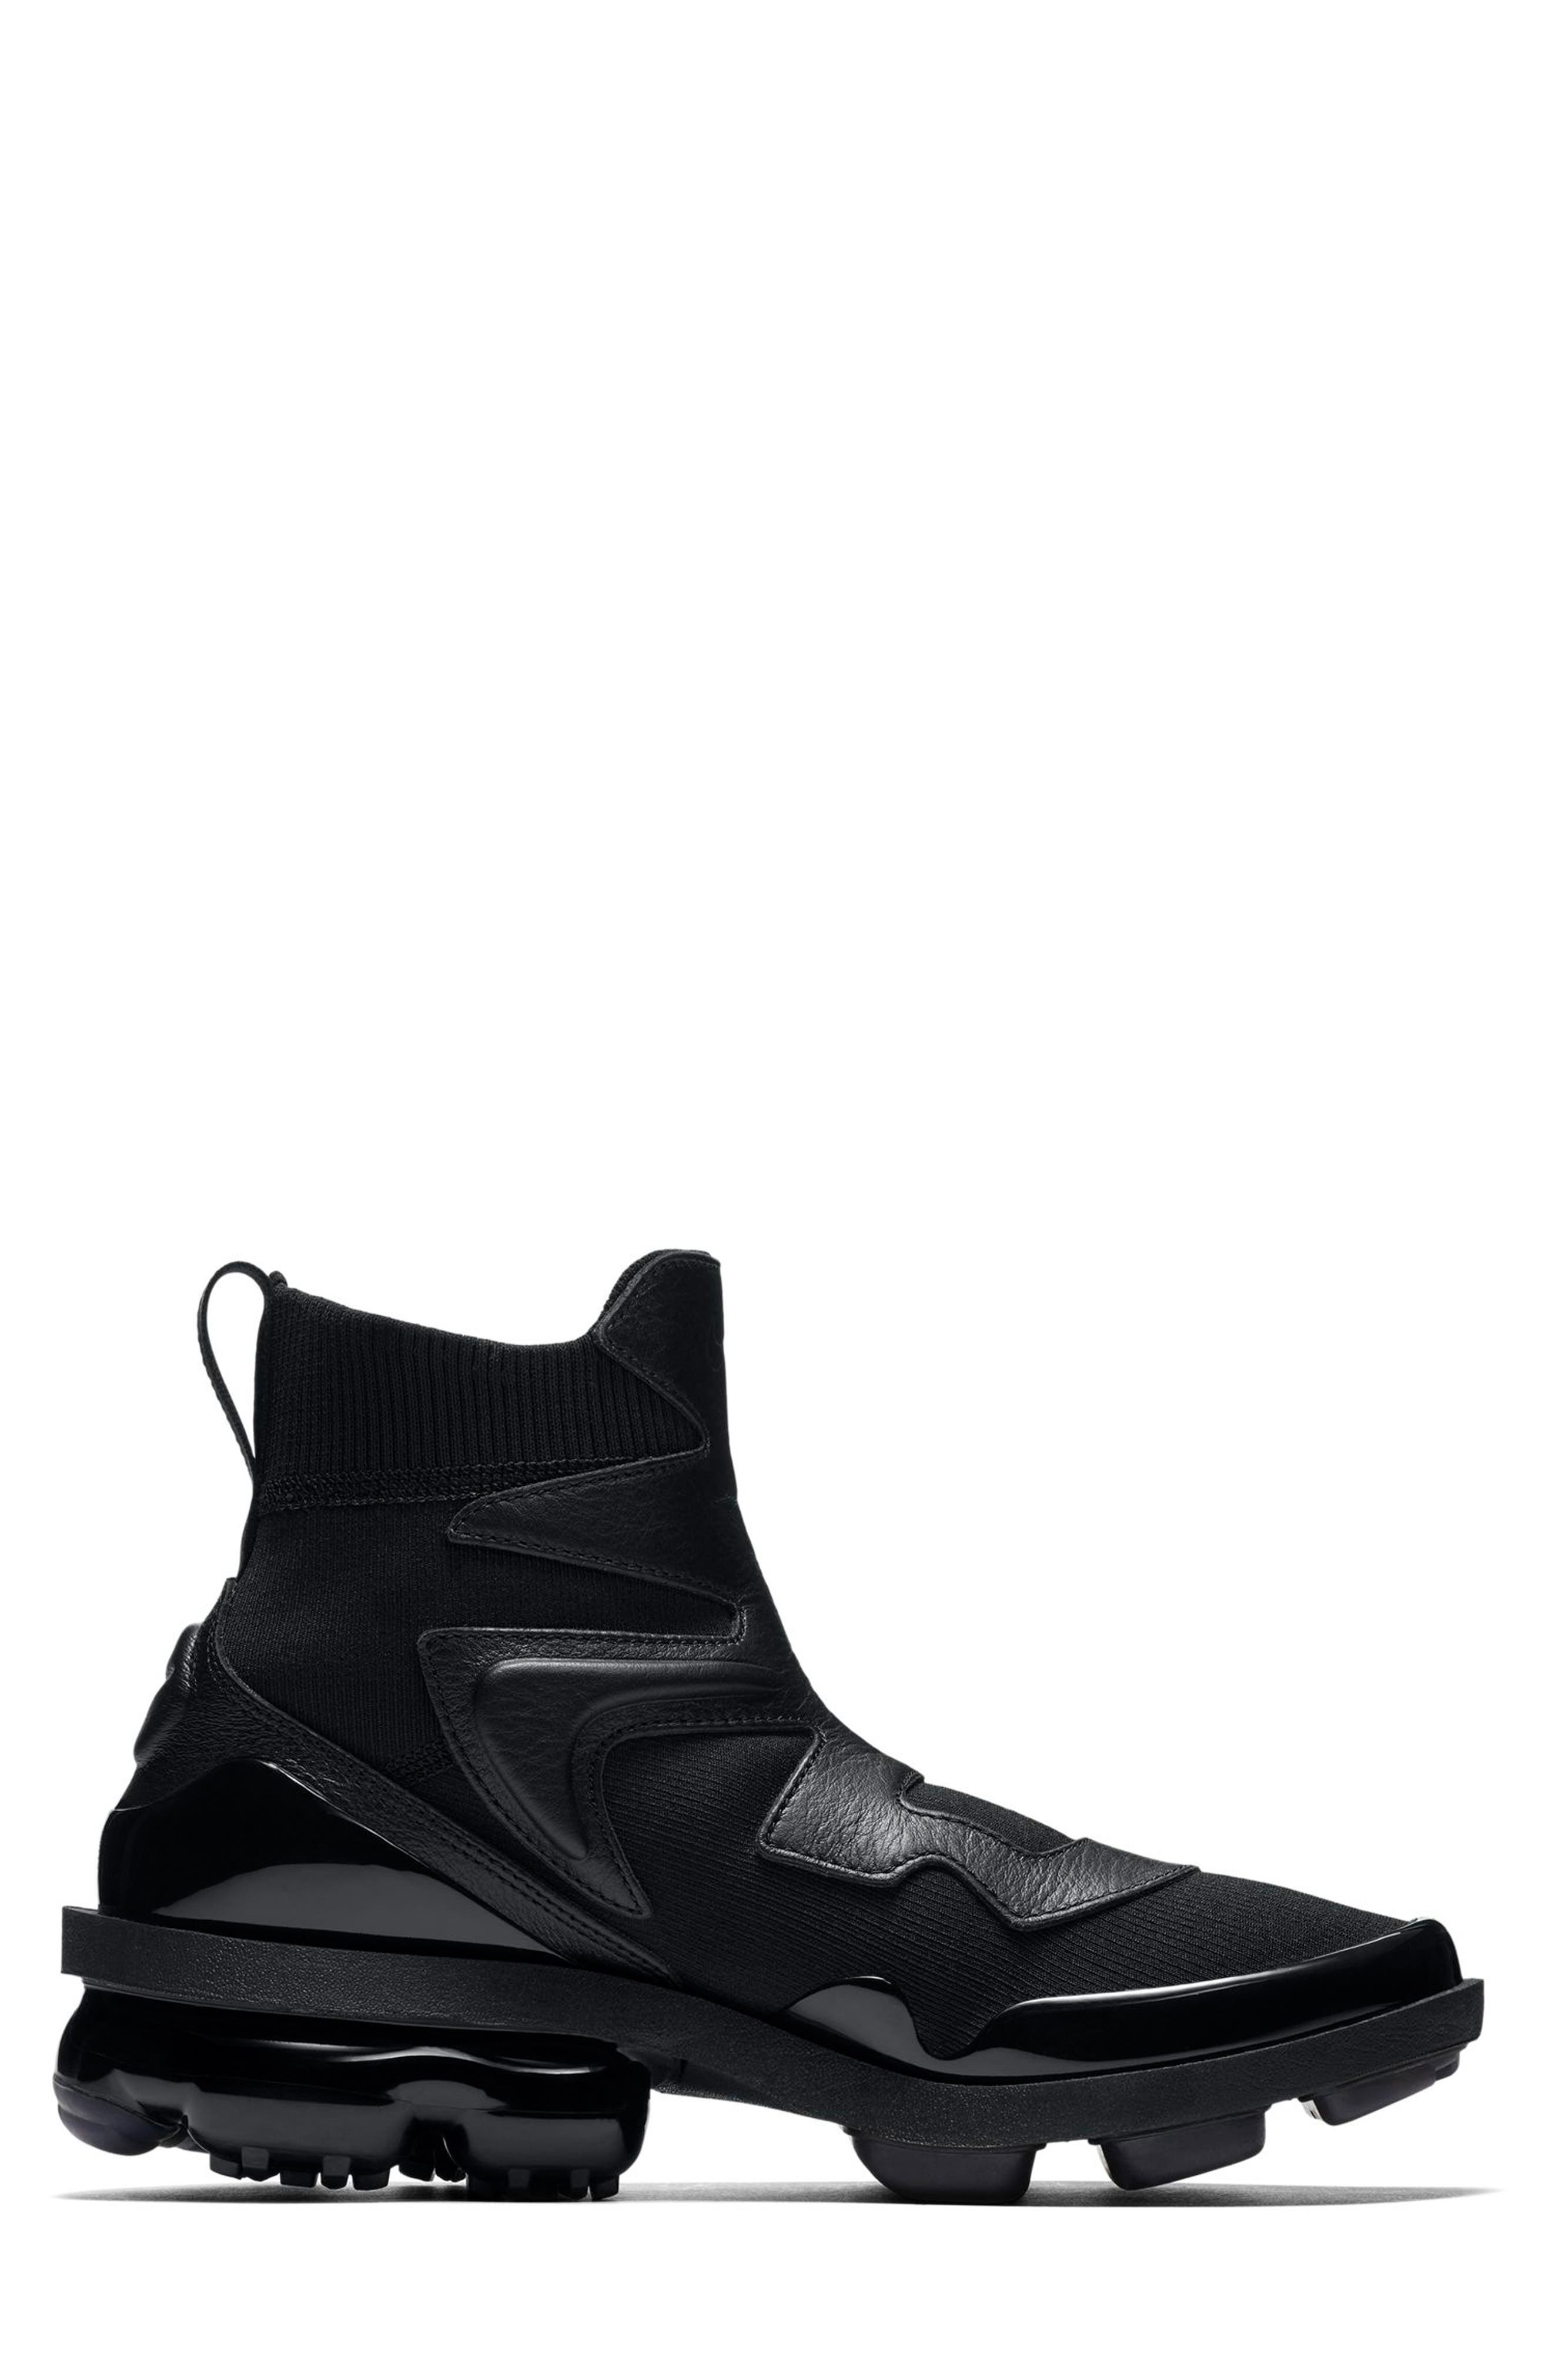 Air Vapormax Light II Sneaker,                             Alternate thumbnail 3, color,                             BLACK/ BLACK